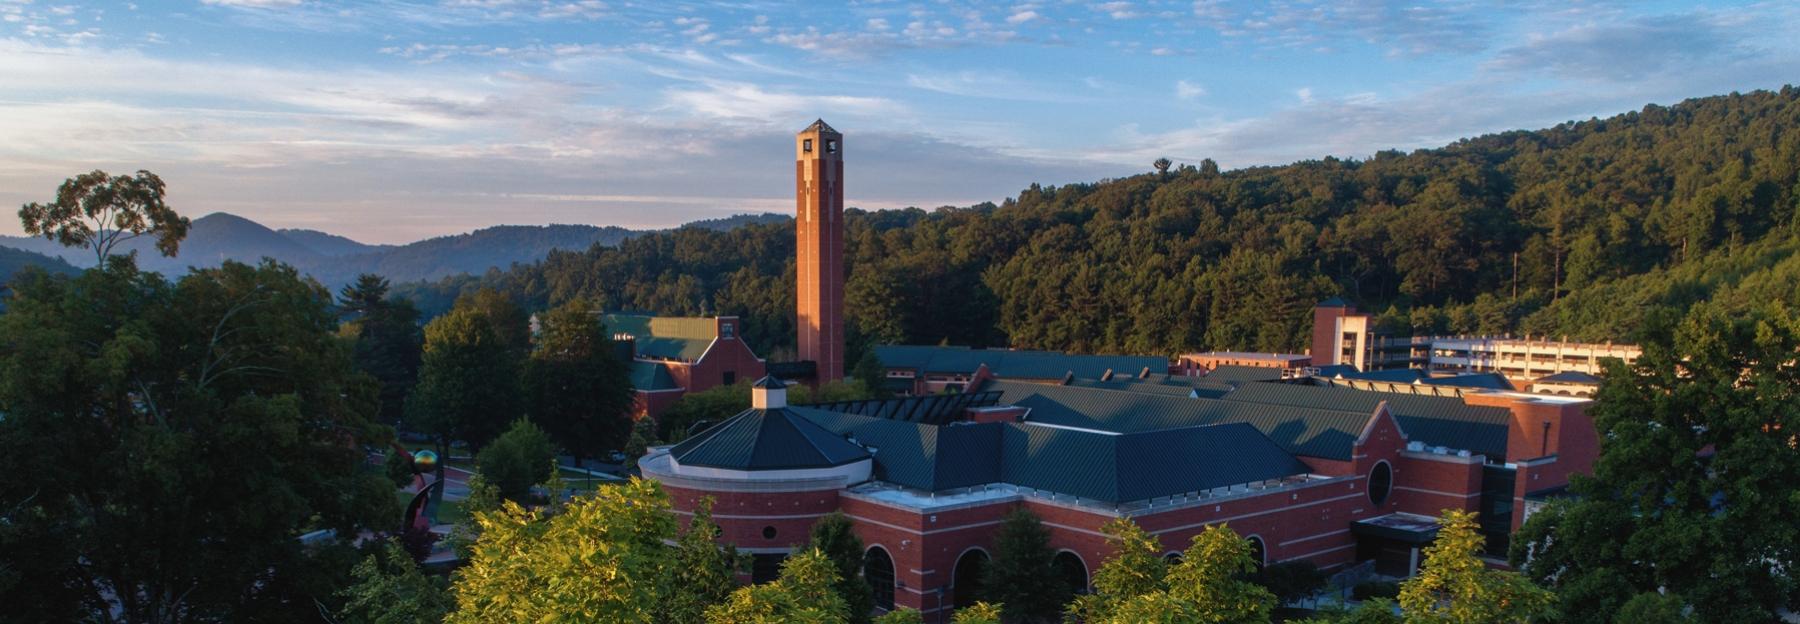 Sunrise over Appalachian State University campus